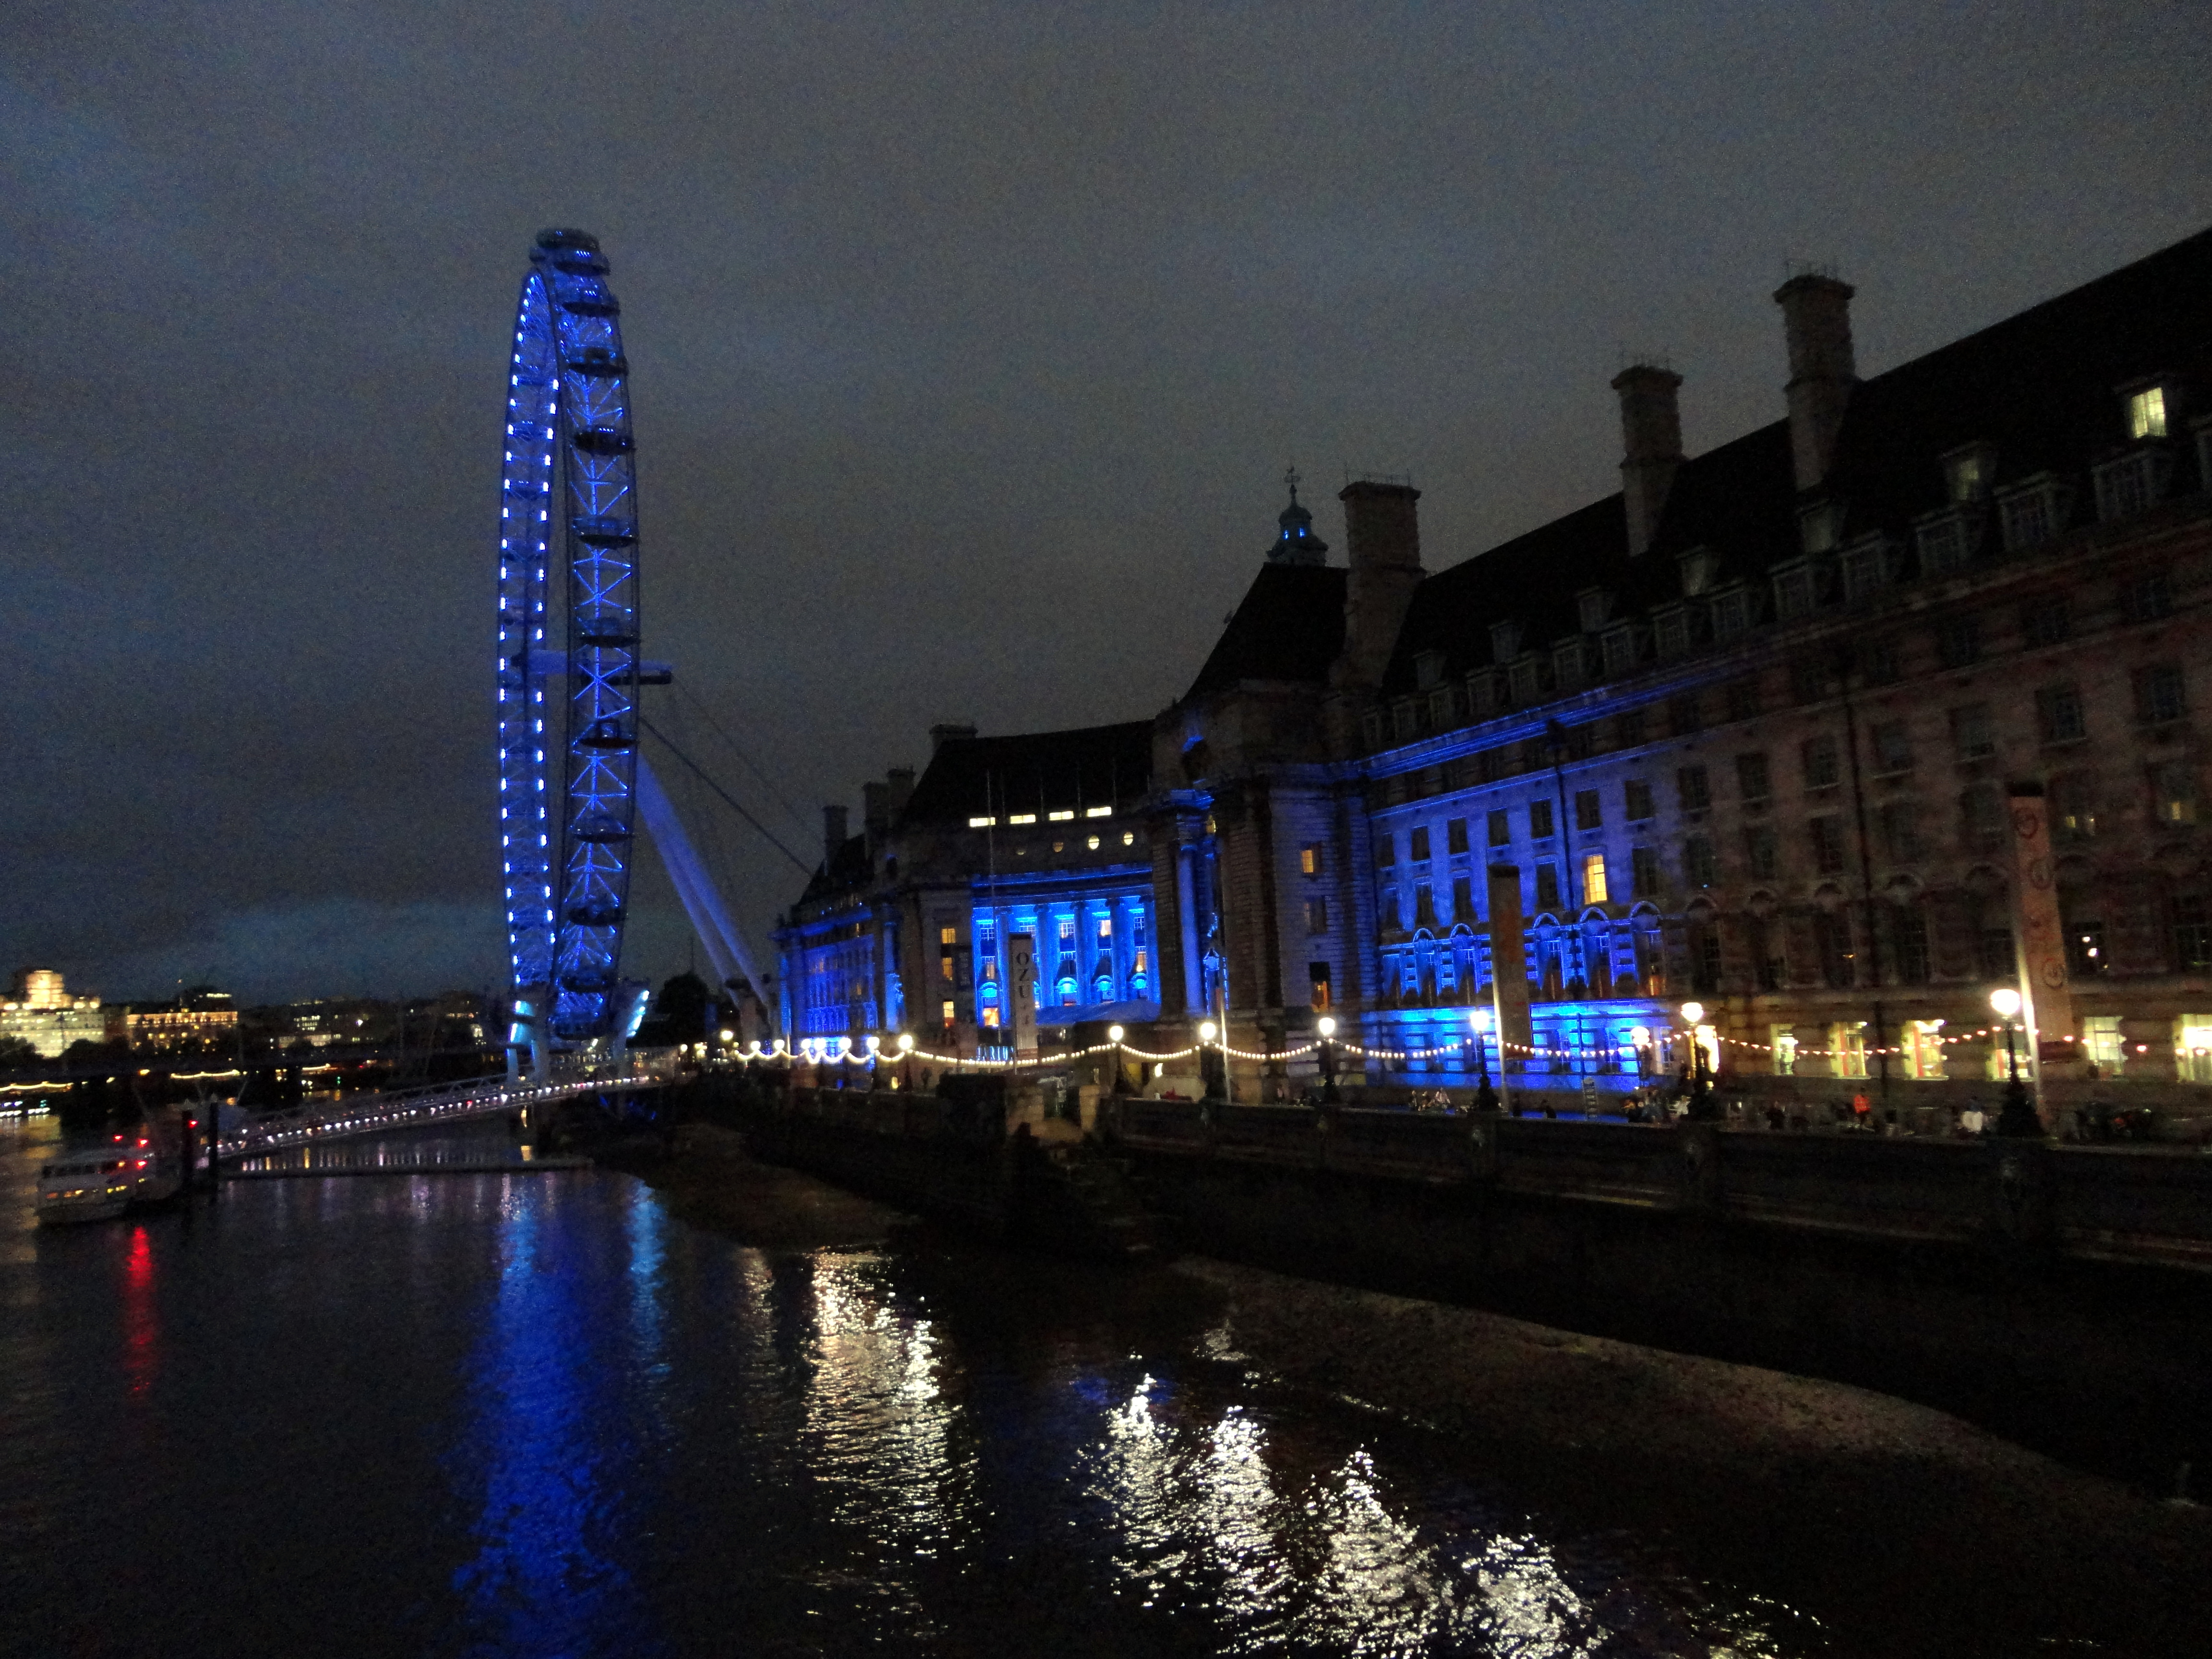 London Marriott Hotel Marble Arch London United Kingdom